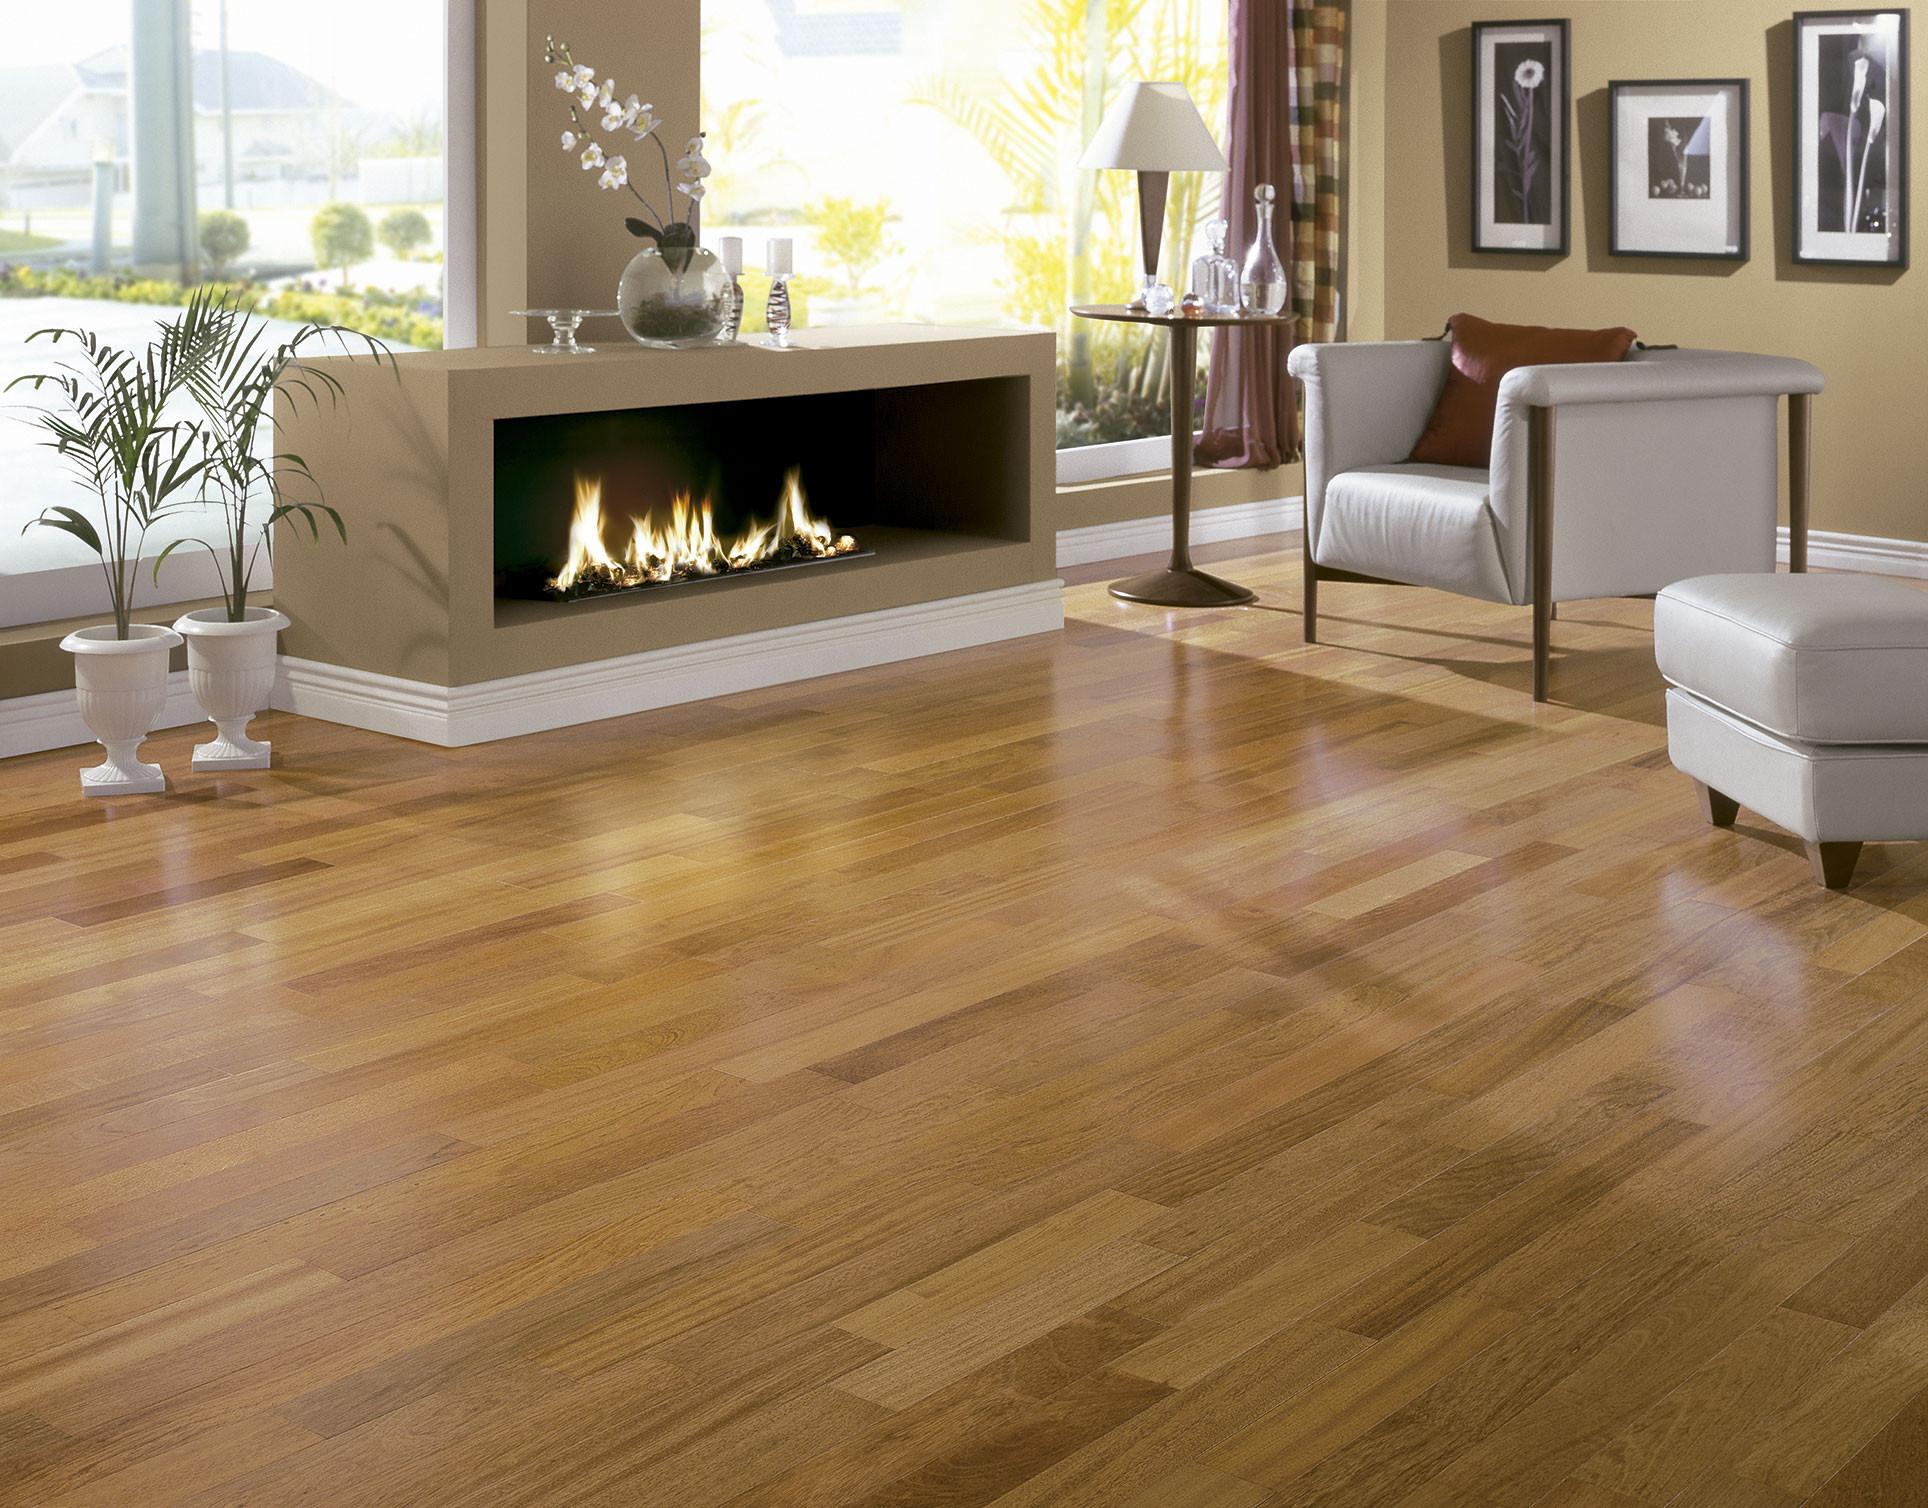 hardwood floor patterns pictures of hardwood floor patterns 25 luxury bedroom flooring ideas and choices with regard to hardwood floor patterns 25 luxury bedroom flooring ideas and choices